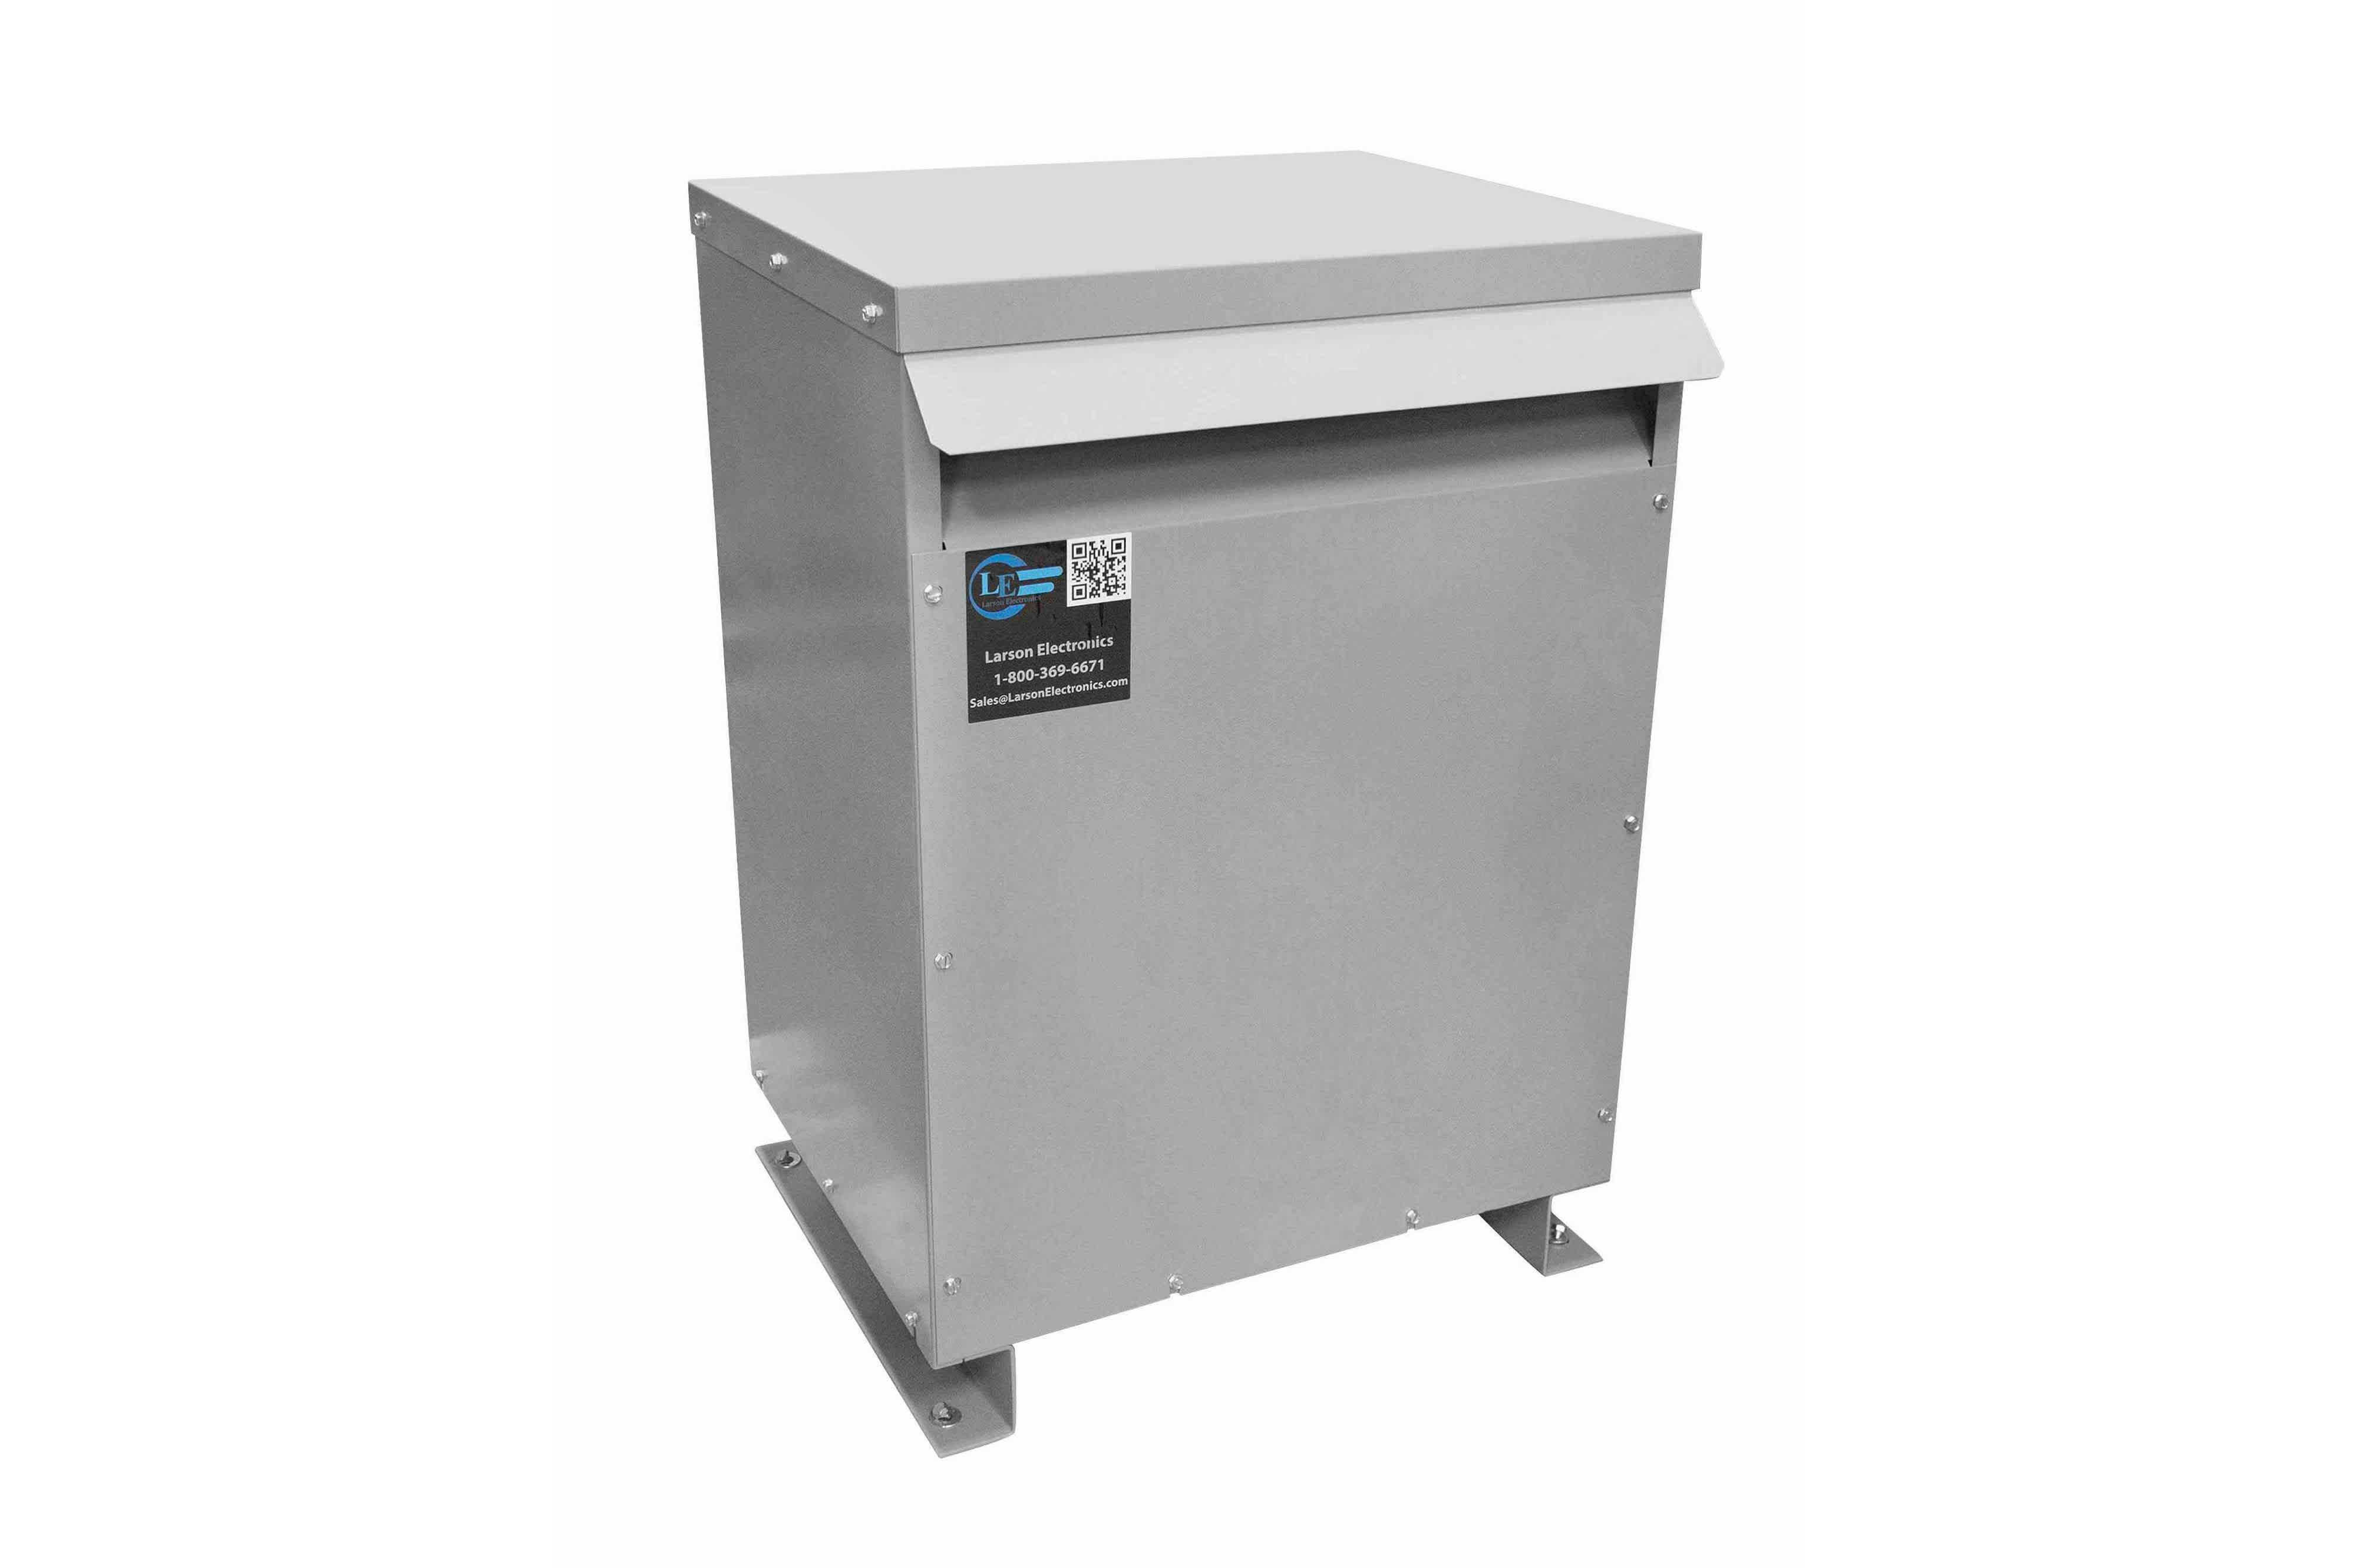 250 kVA 3PH Isolation Transformer, 400V Wye Primary, 480Y/277 Wye-N Secondary, N3R, Ventilated, 60 Hz